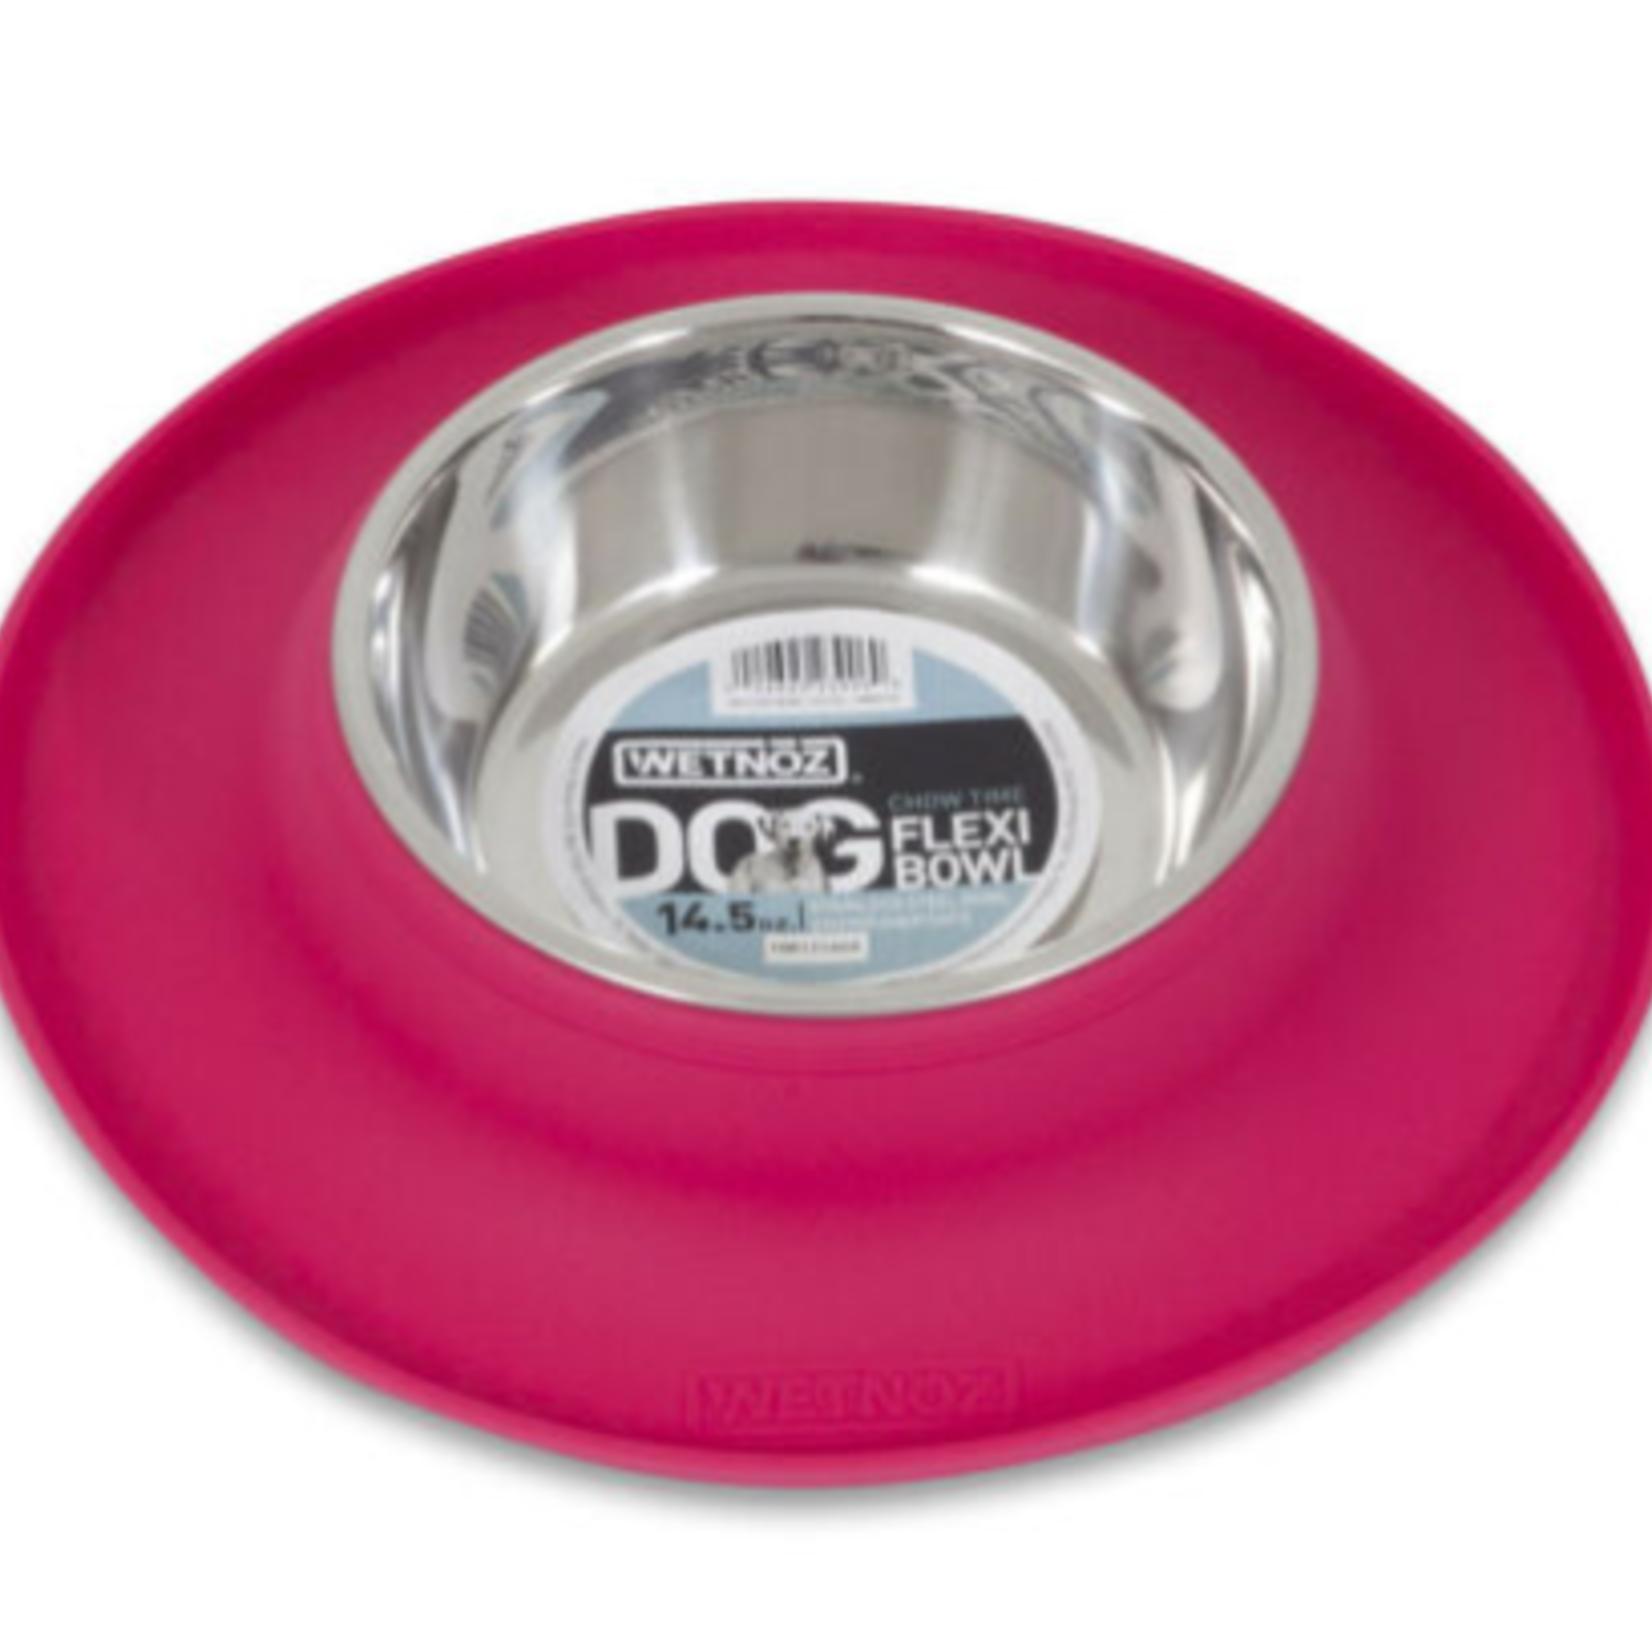 Wetnoz Flexi Bowl -14.5 oz - Silicone HIBISCUS